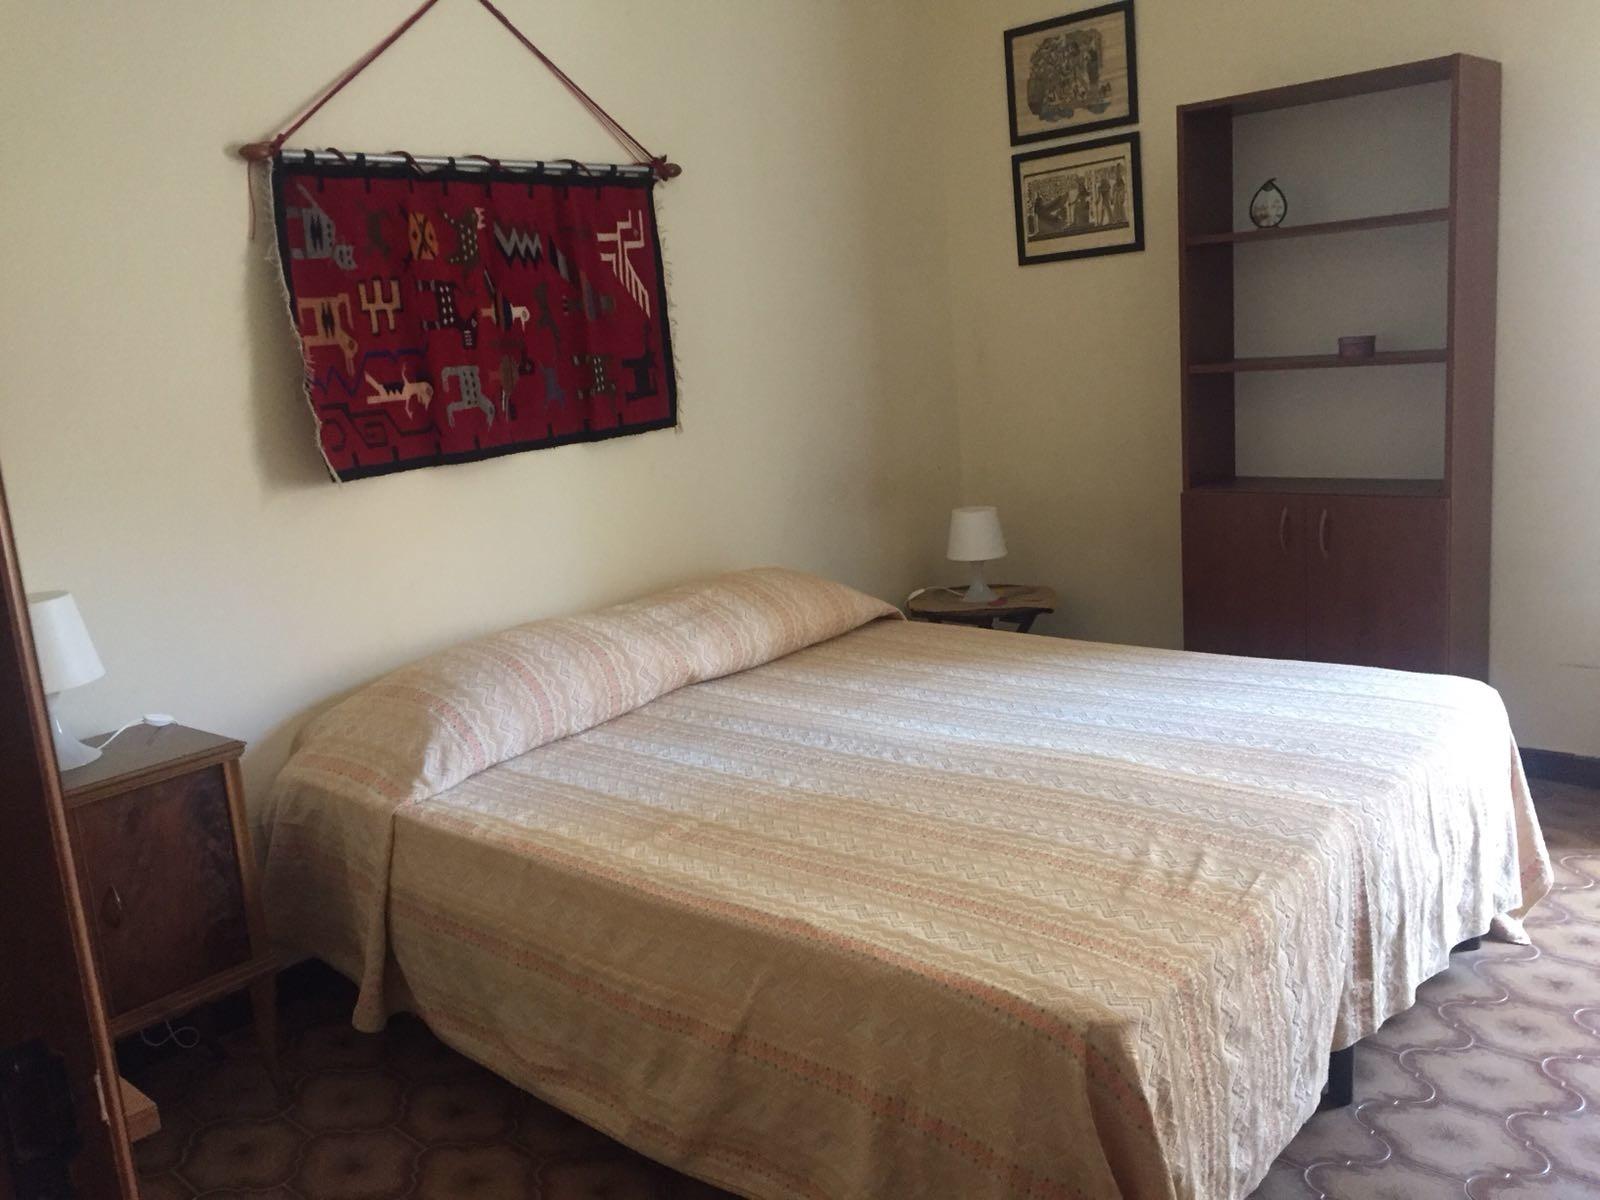 single-room-zone-castello-ursino-970ce55348d0866d1b1ebae49723981b